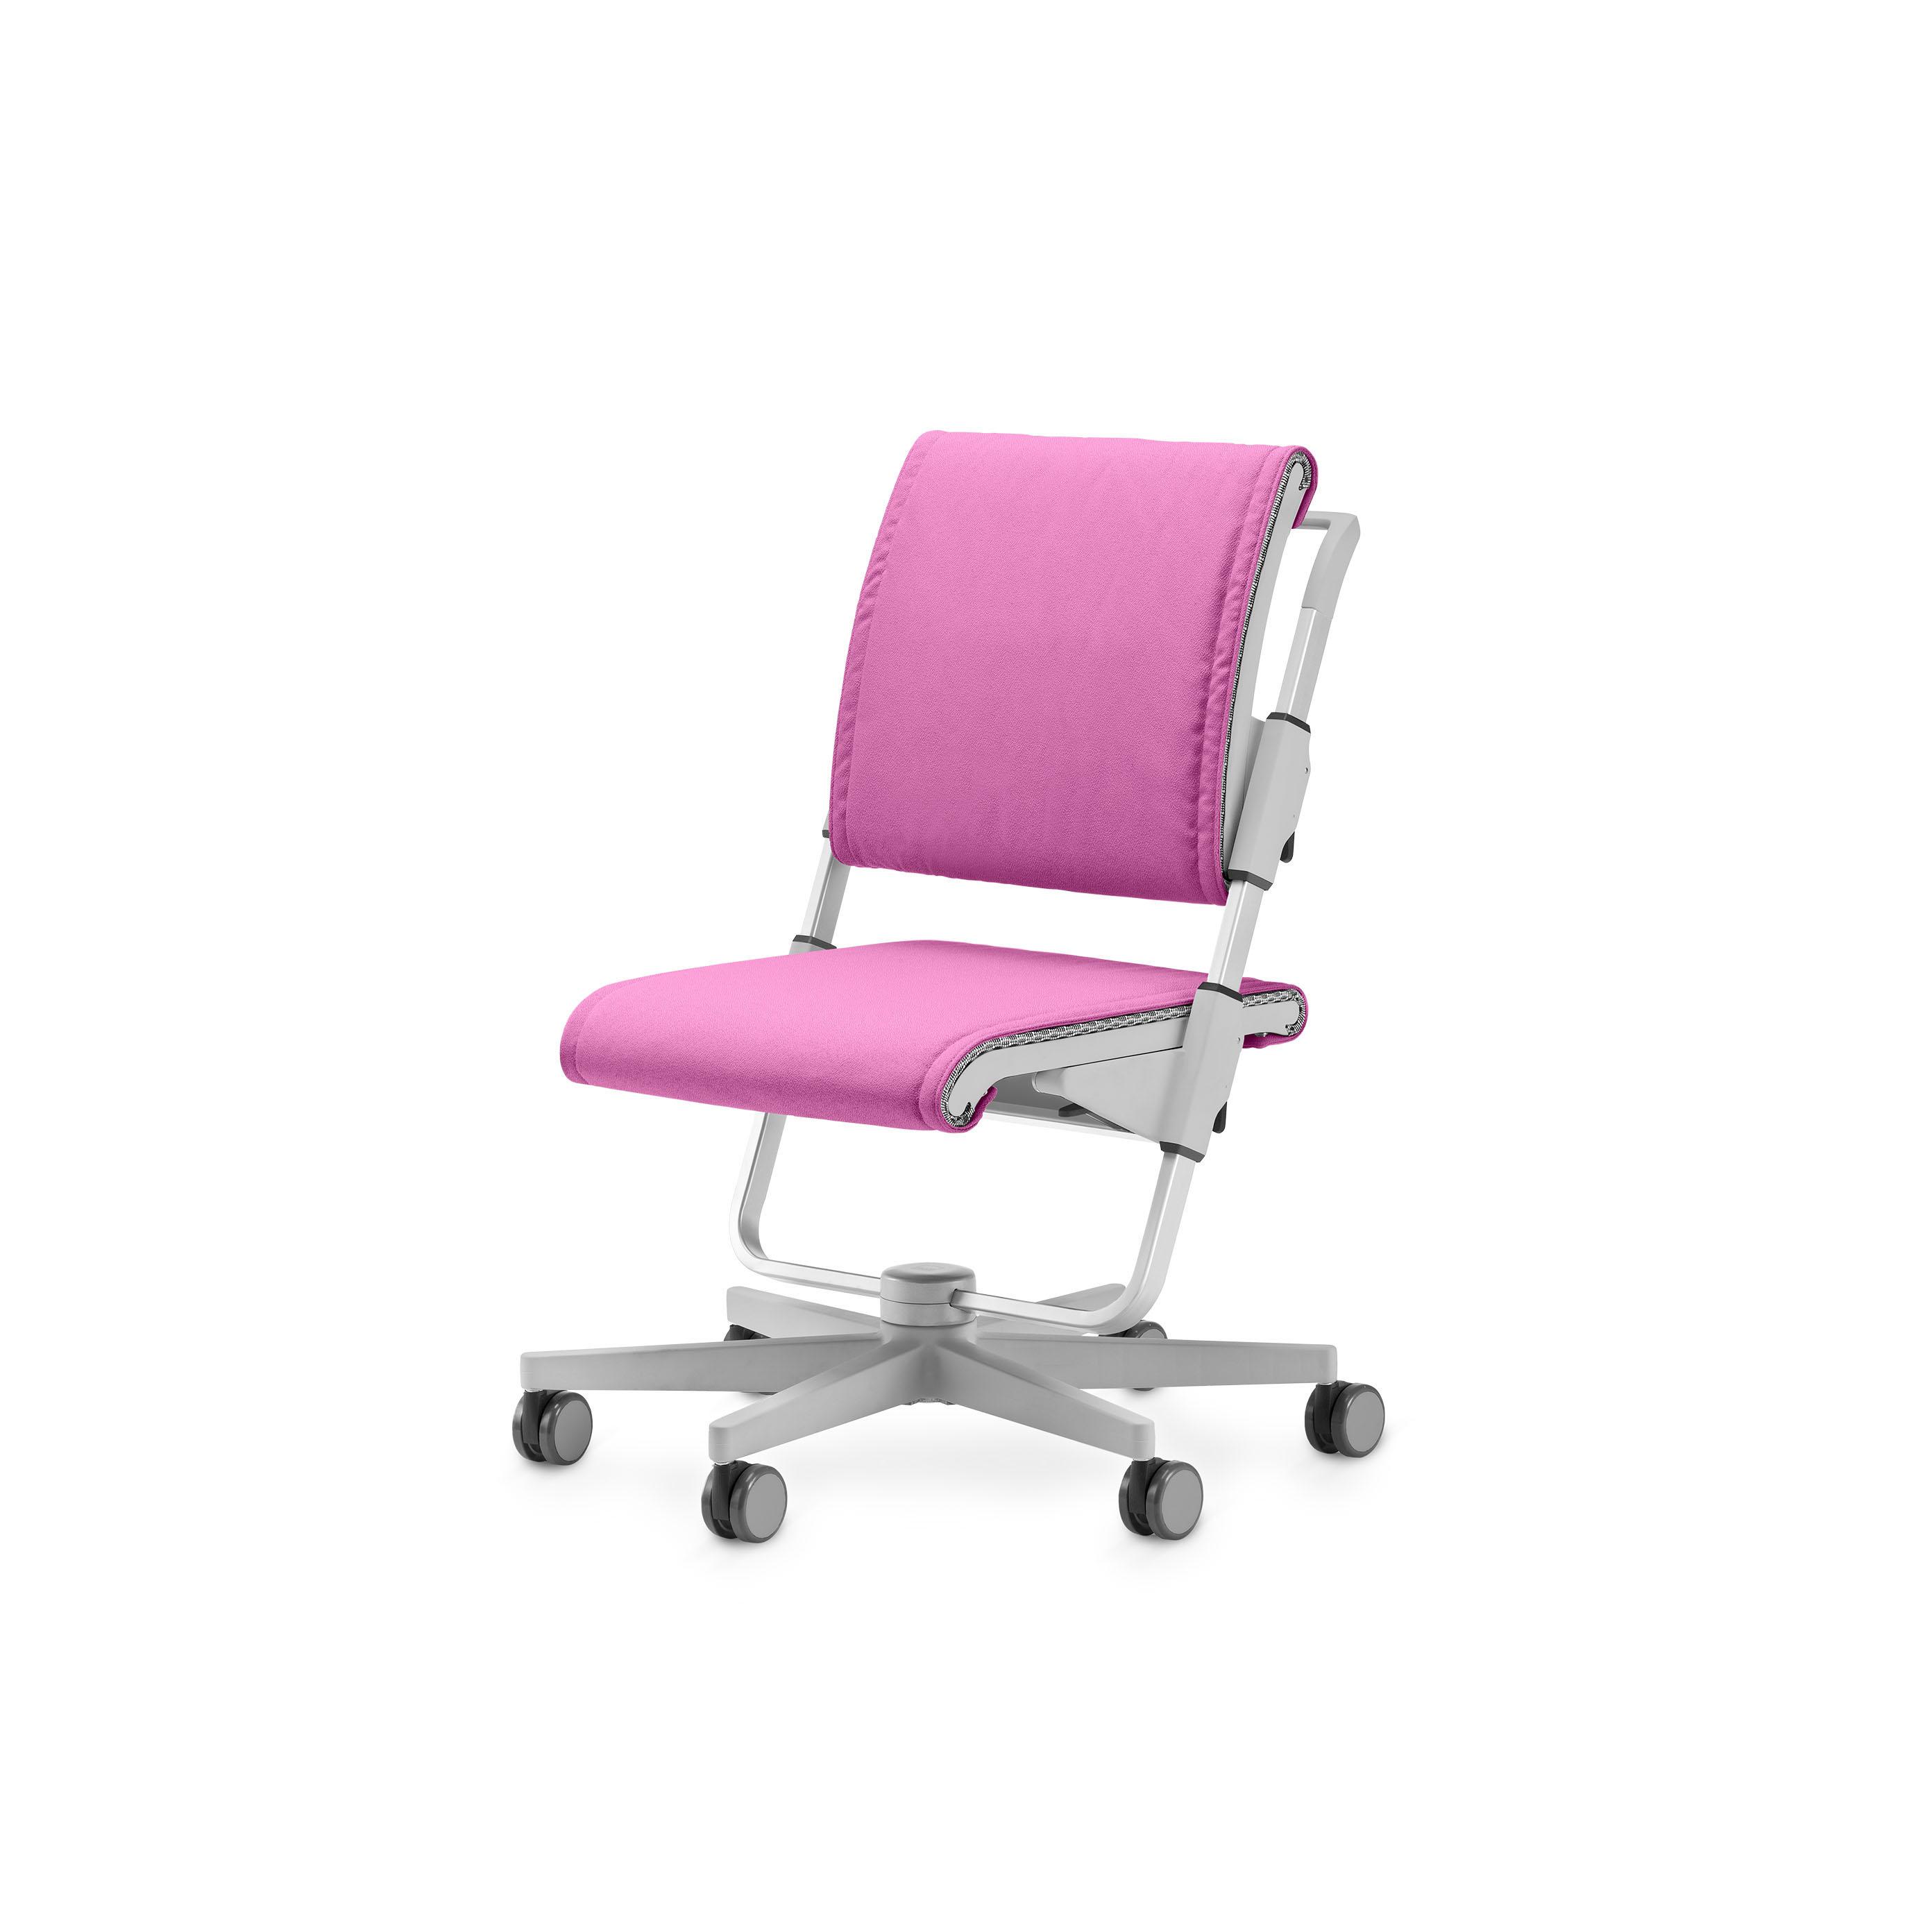 moll-Scooter-grau-rosa-01-Kopie2